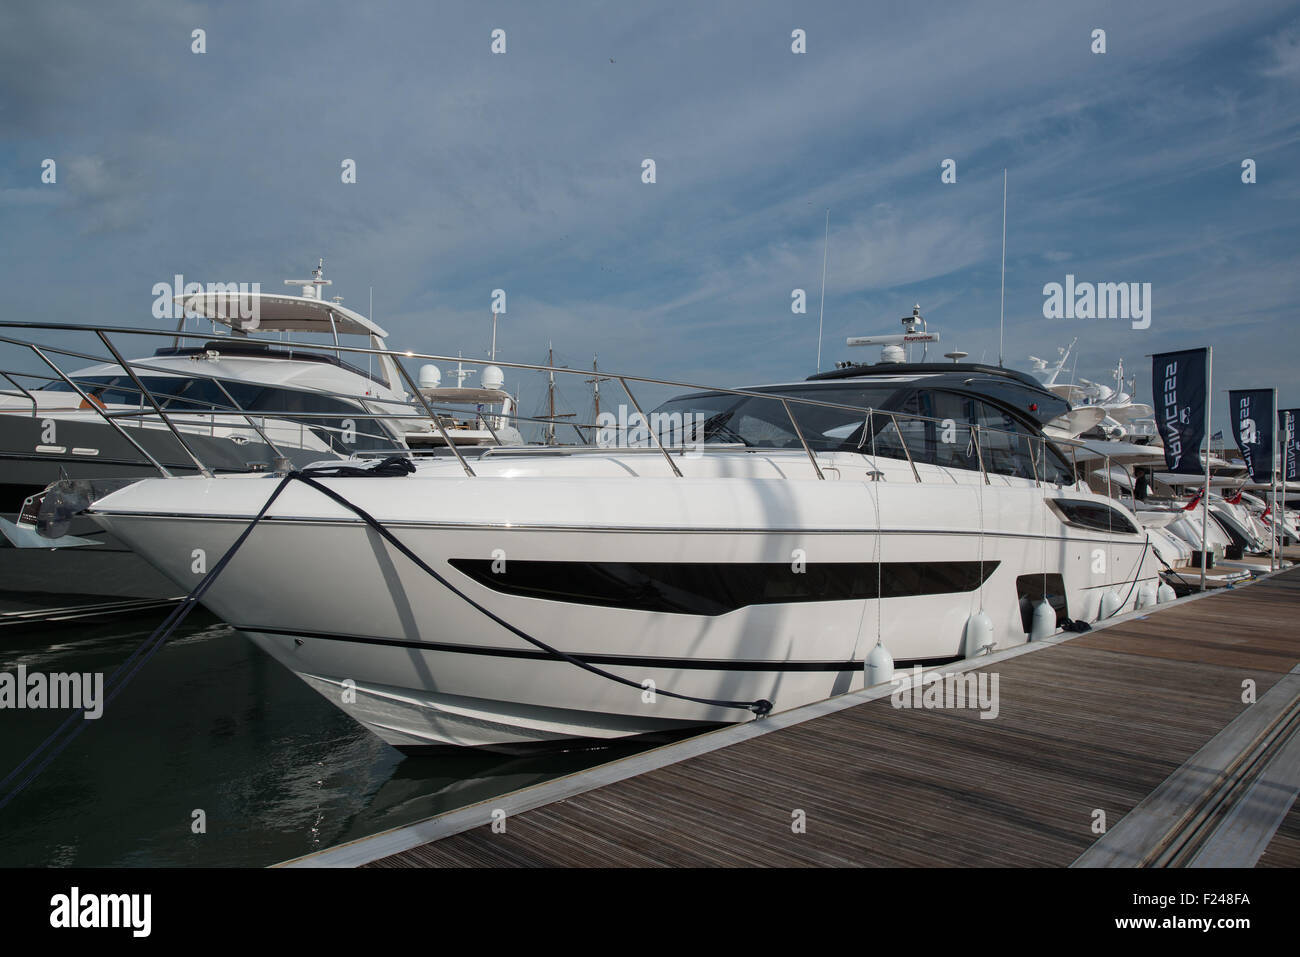 Southampton, UK. 11. September 2015. Southampton Boat Show 2015. Princess V58 Open ins Leben gerufen, auf der Messe. Stockfoto